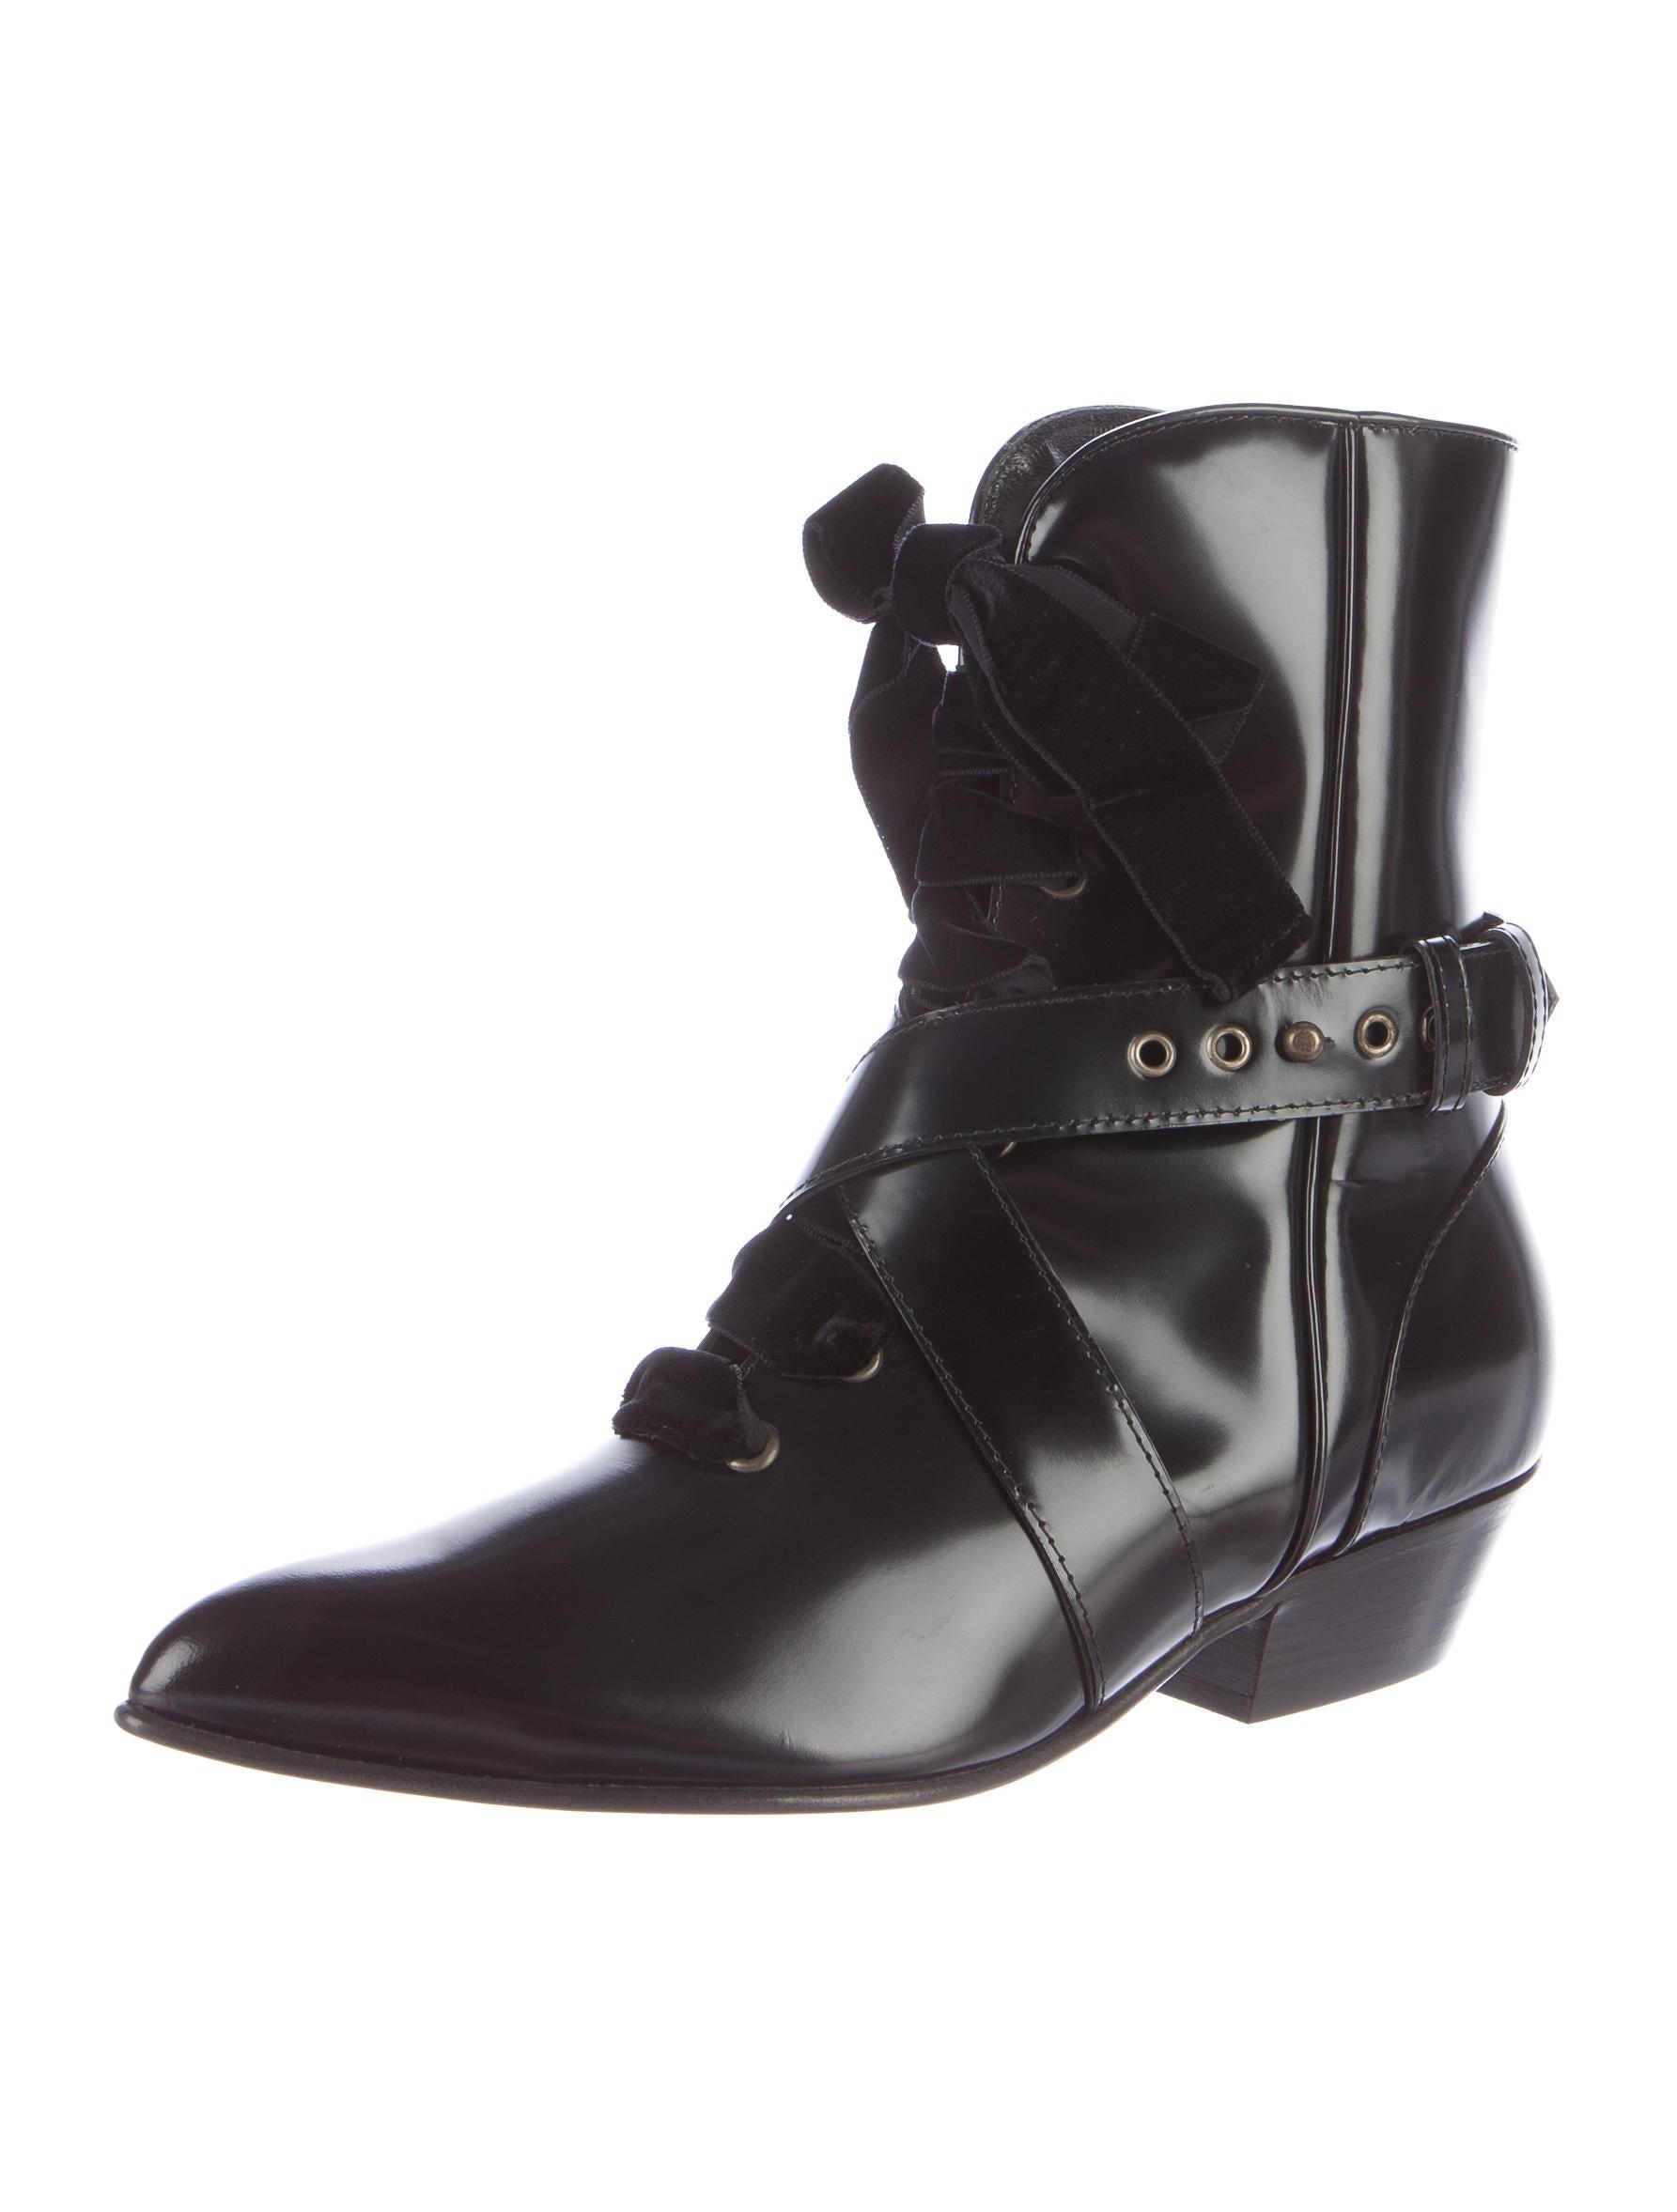 Philosophy di Lorenzo Serafini Patent Leather Pointed-Toe Boots cheap classic ZiOdKHx